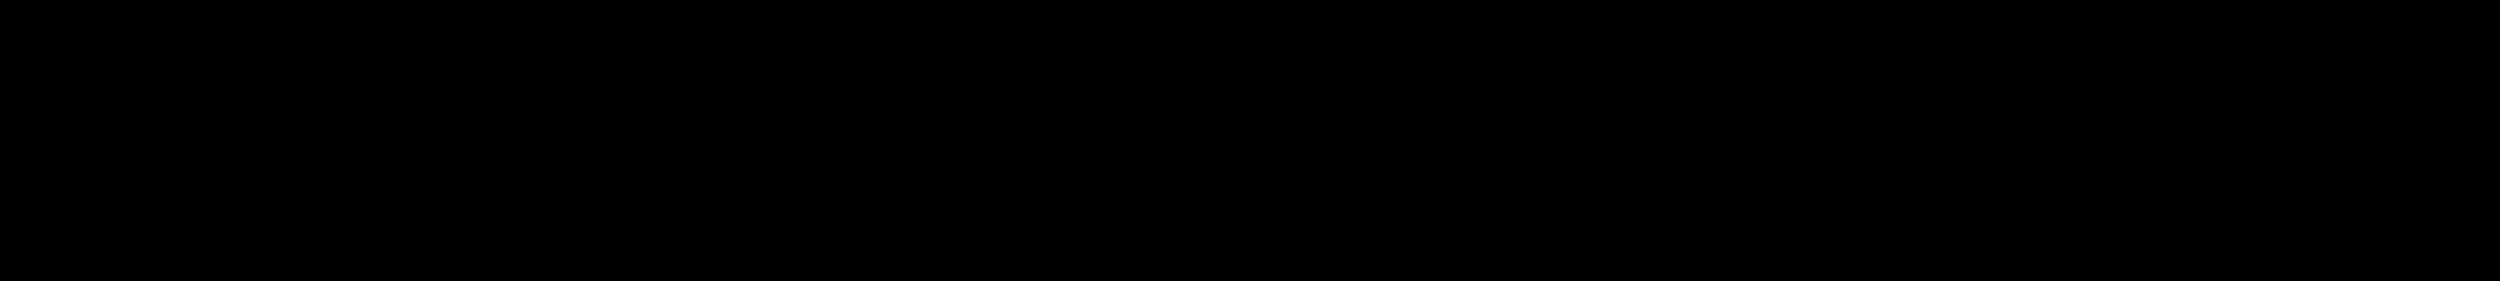 carbon black logo.png